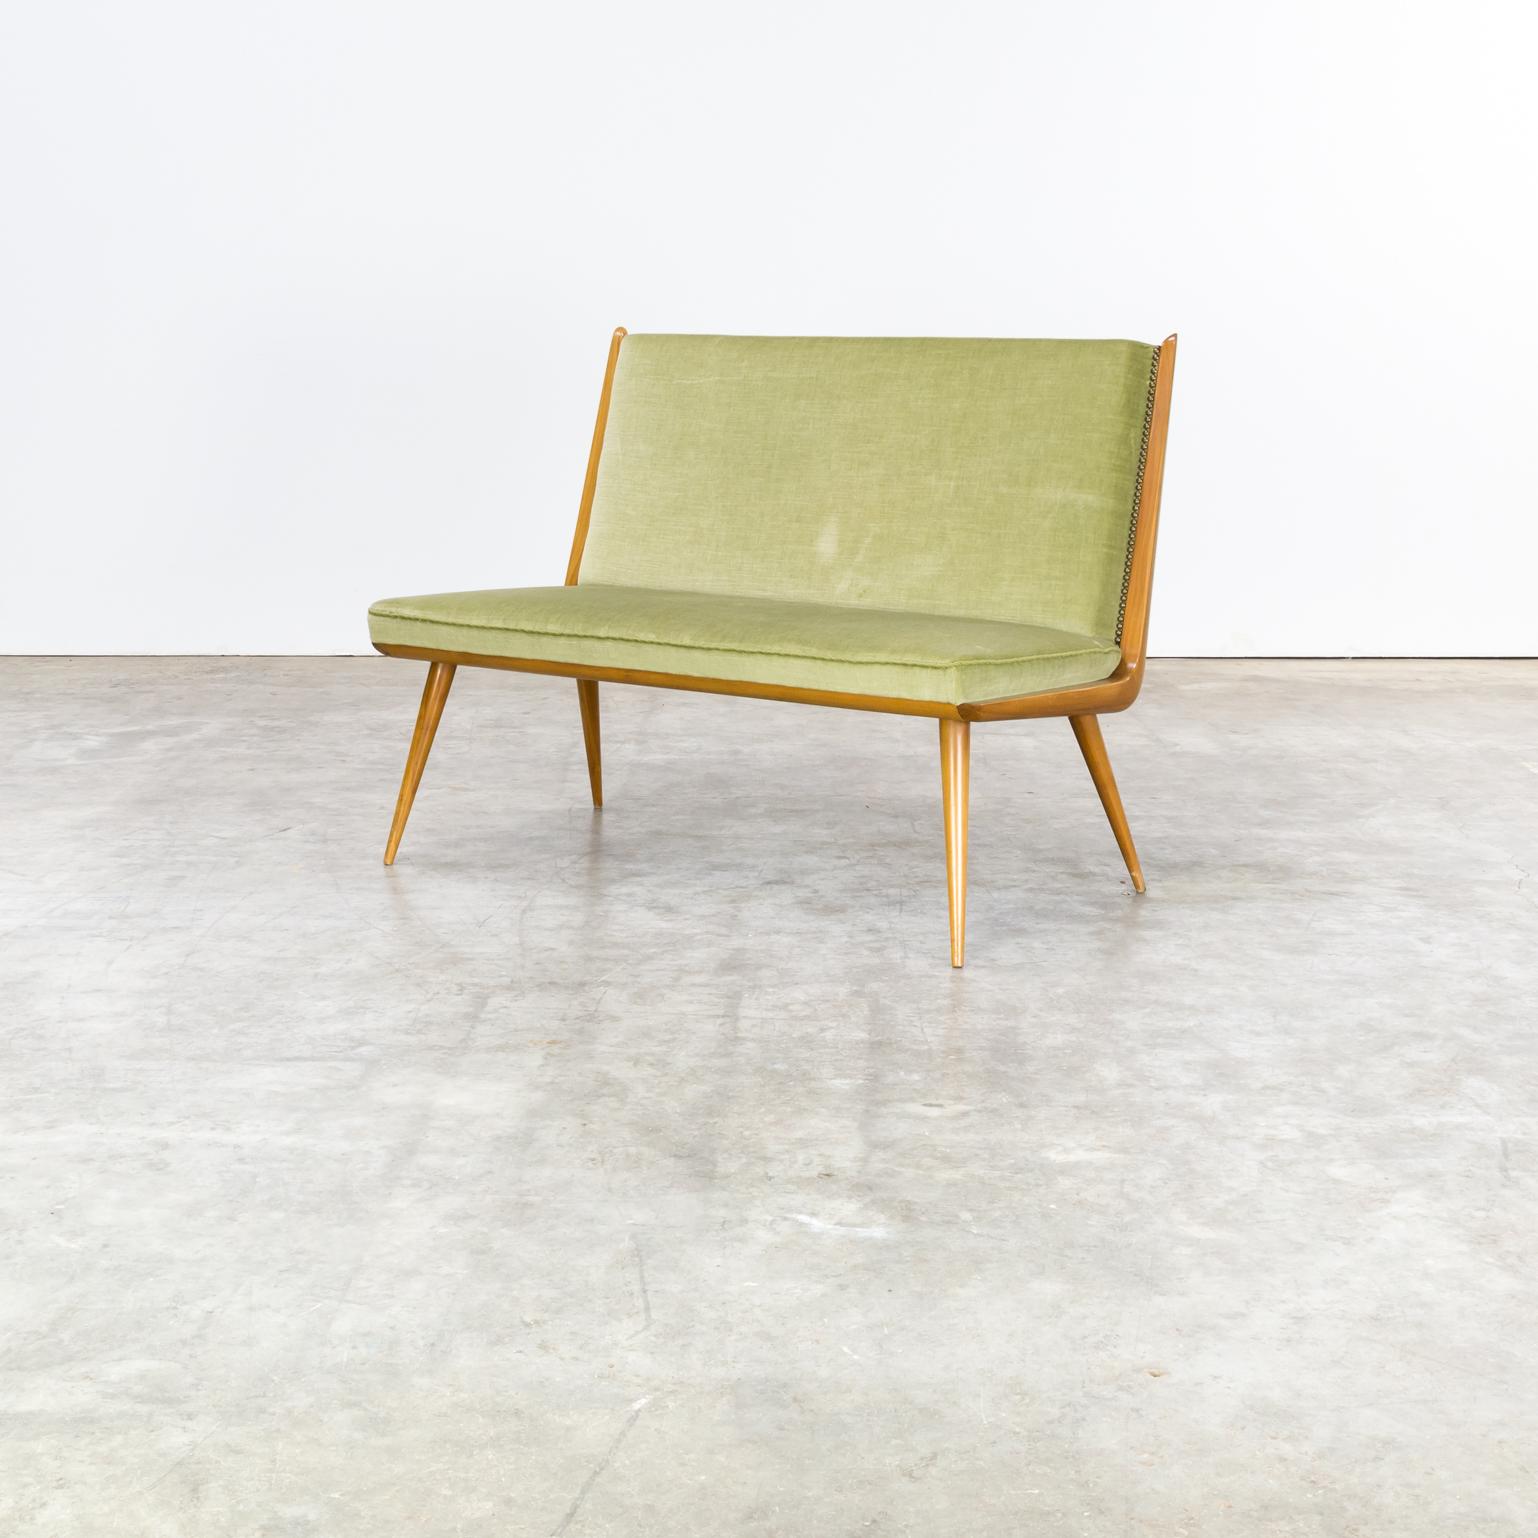 Boomerang danish design dining chairs and sofa set/3 | BarbMama